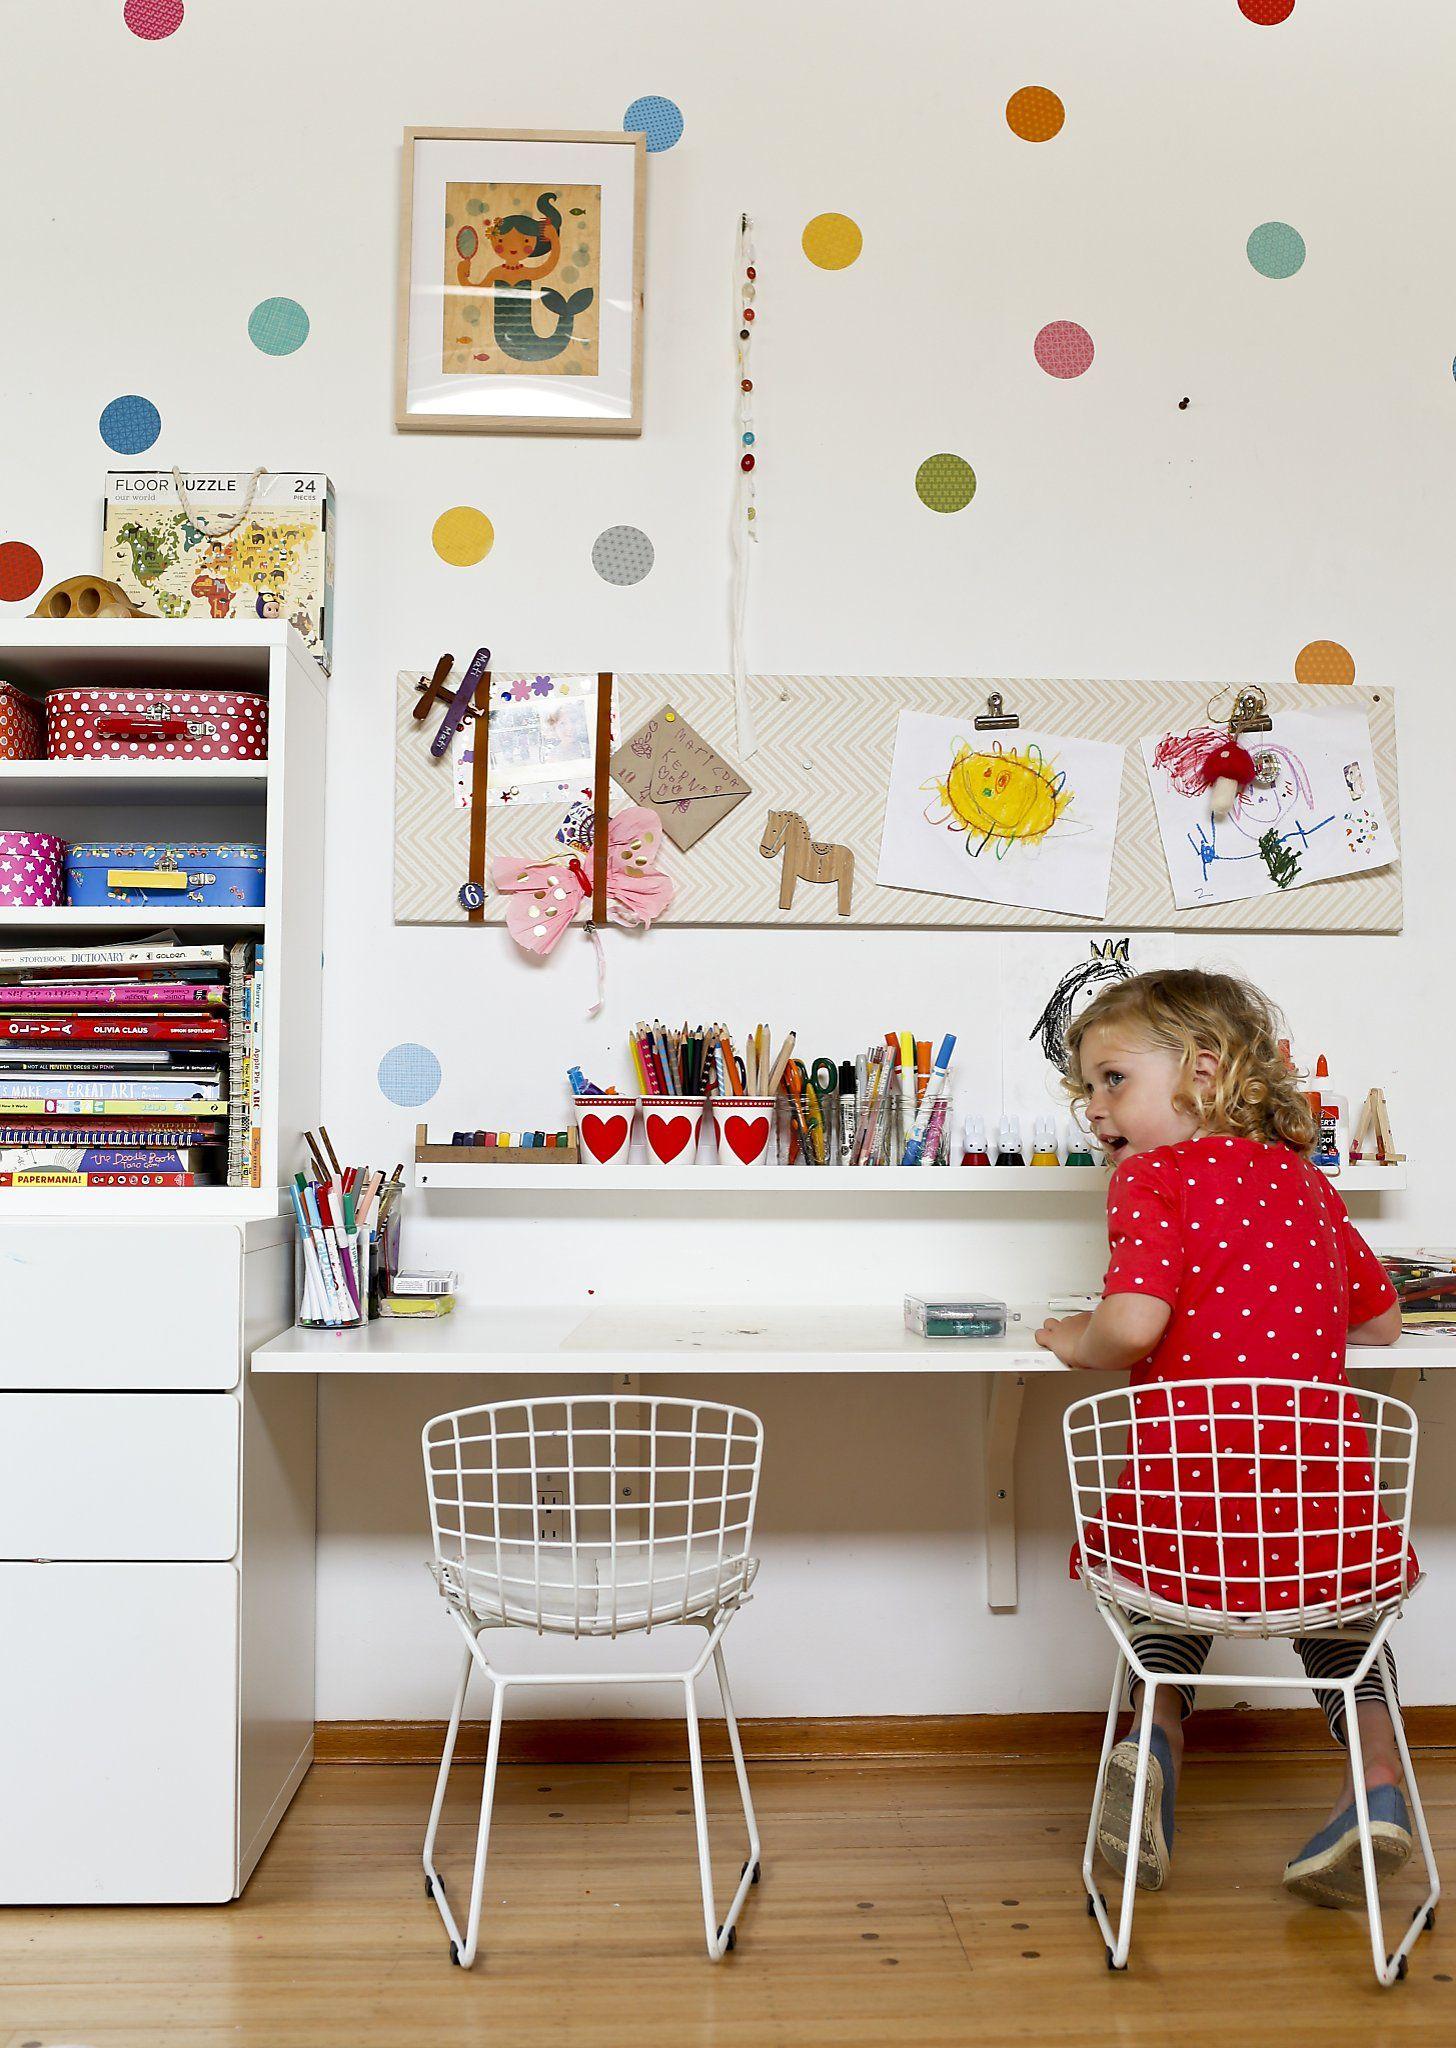 Designer Lorena Siminovich crafts a playful home